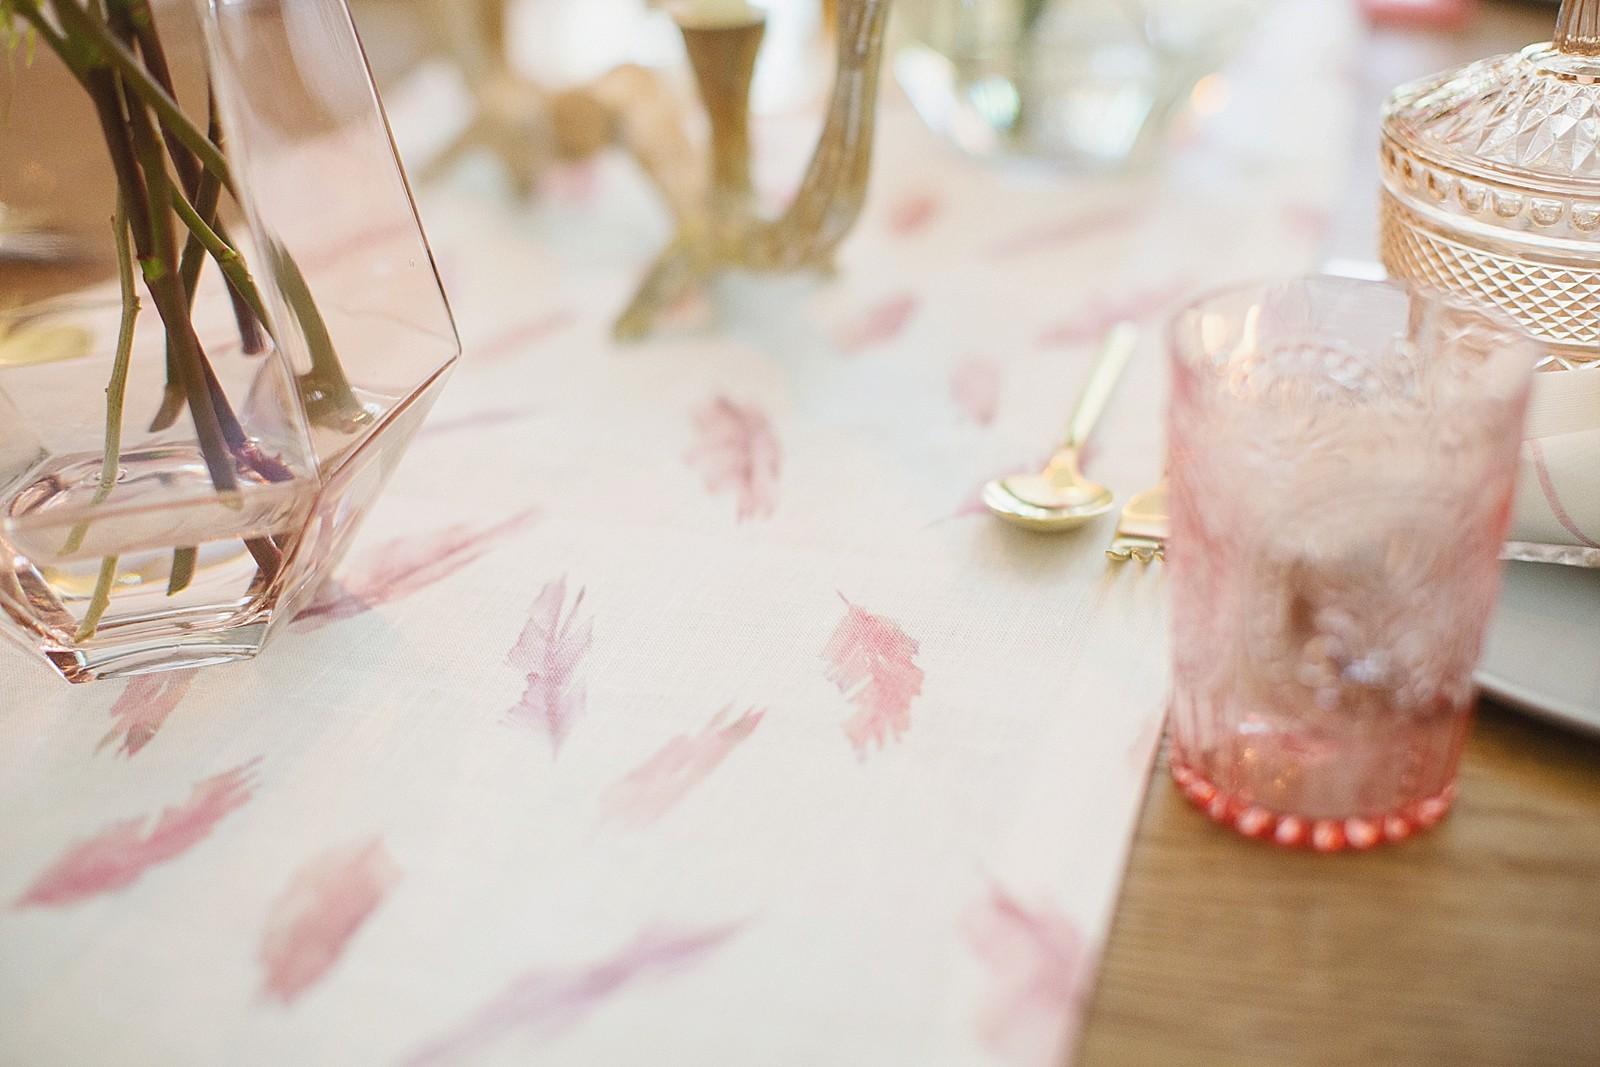 minted-christmas-inspiration-girls-party-photos-diana-elizabeth-blog-lifestyle-hostess-entertainment-home-blog-2255